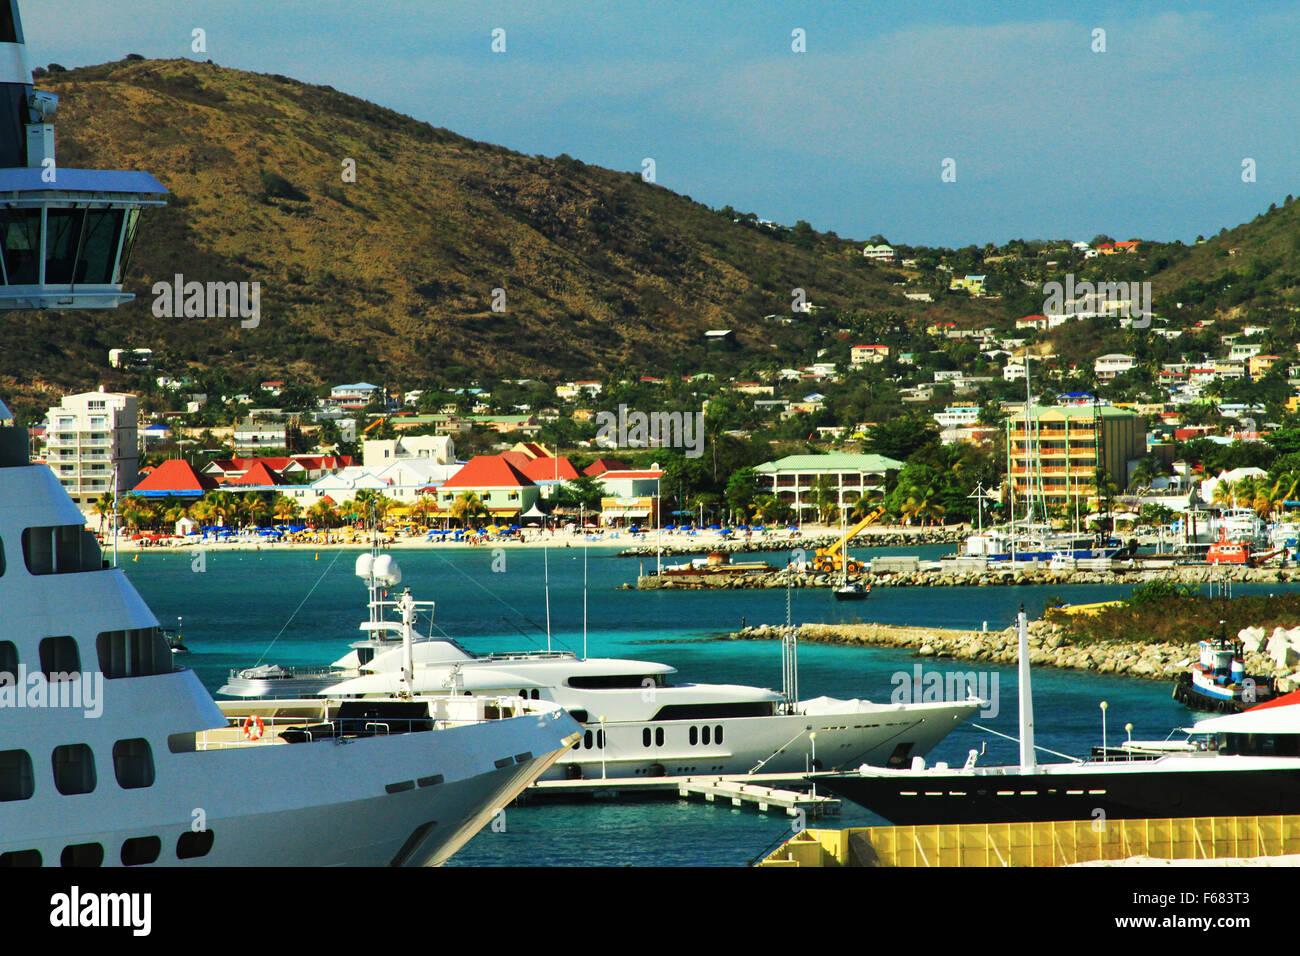 st martin cruise port